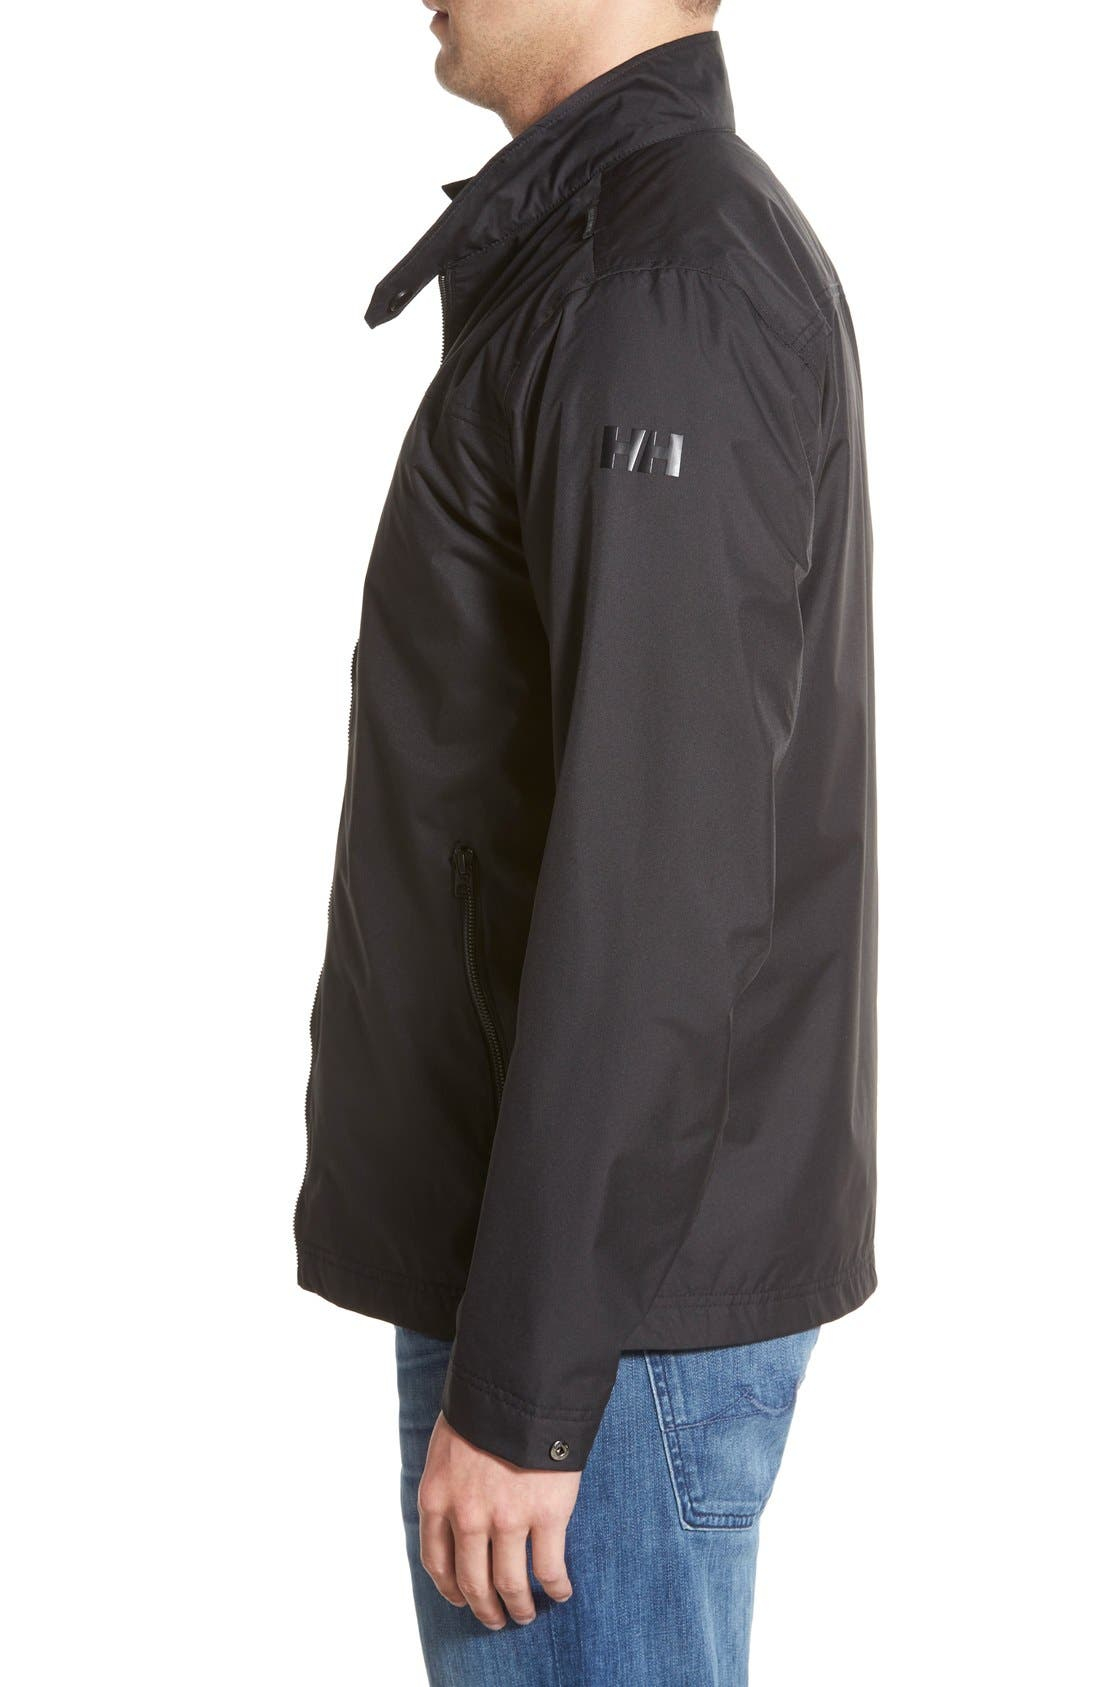 HELLY HANSEN,                             'Derry' Waterproof Jacket,                             Alternate thumbnail 3, color,                             009